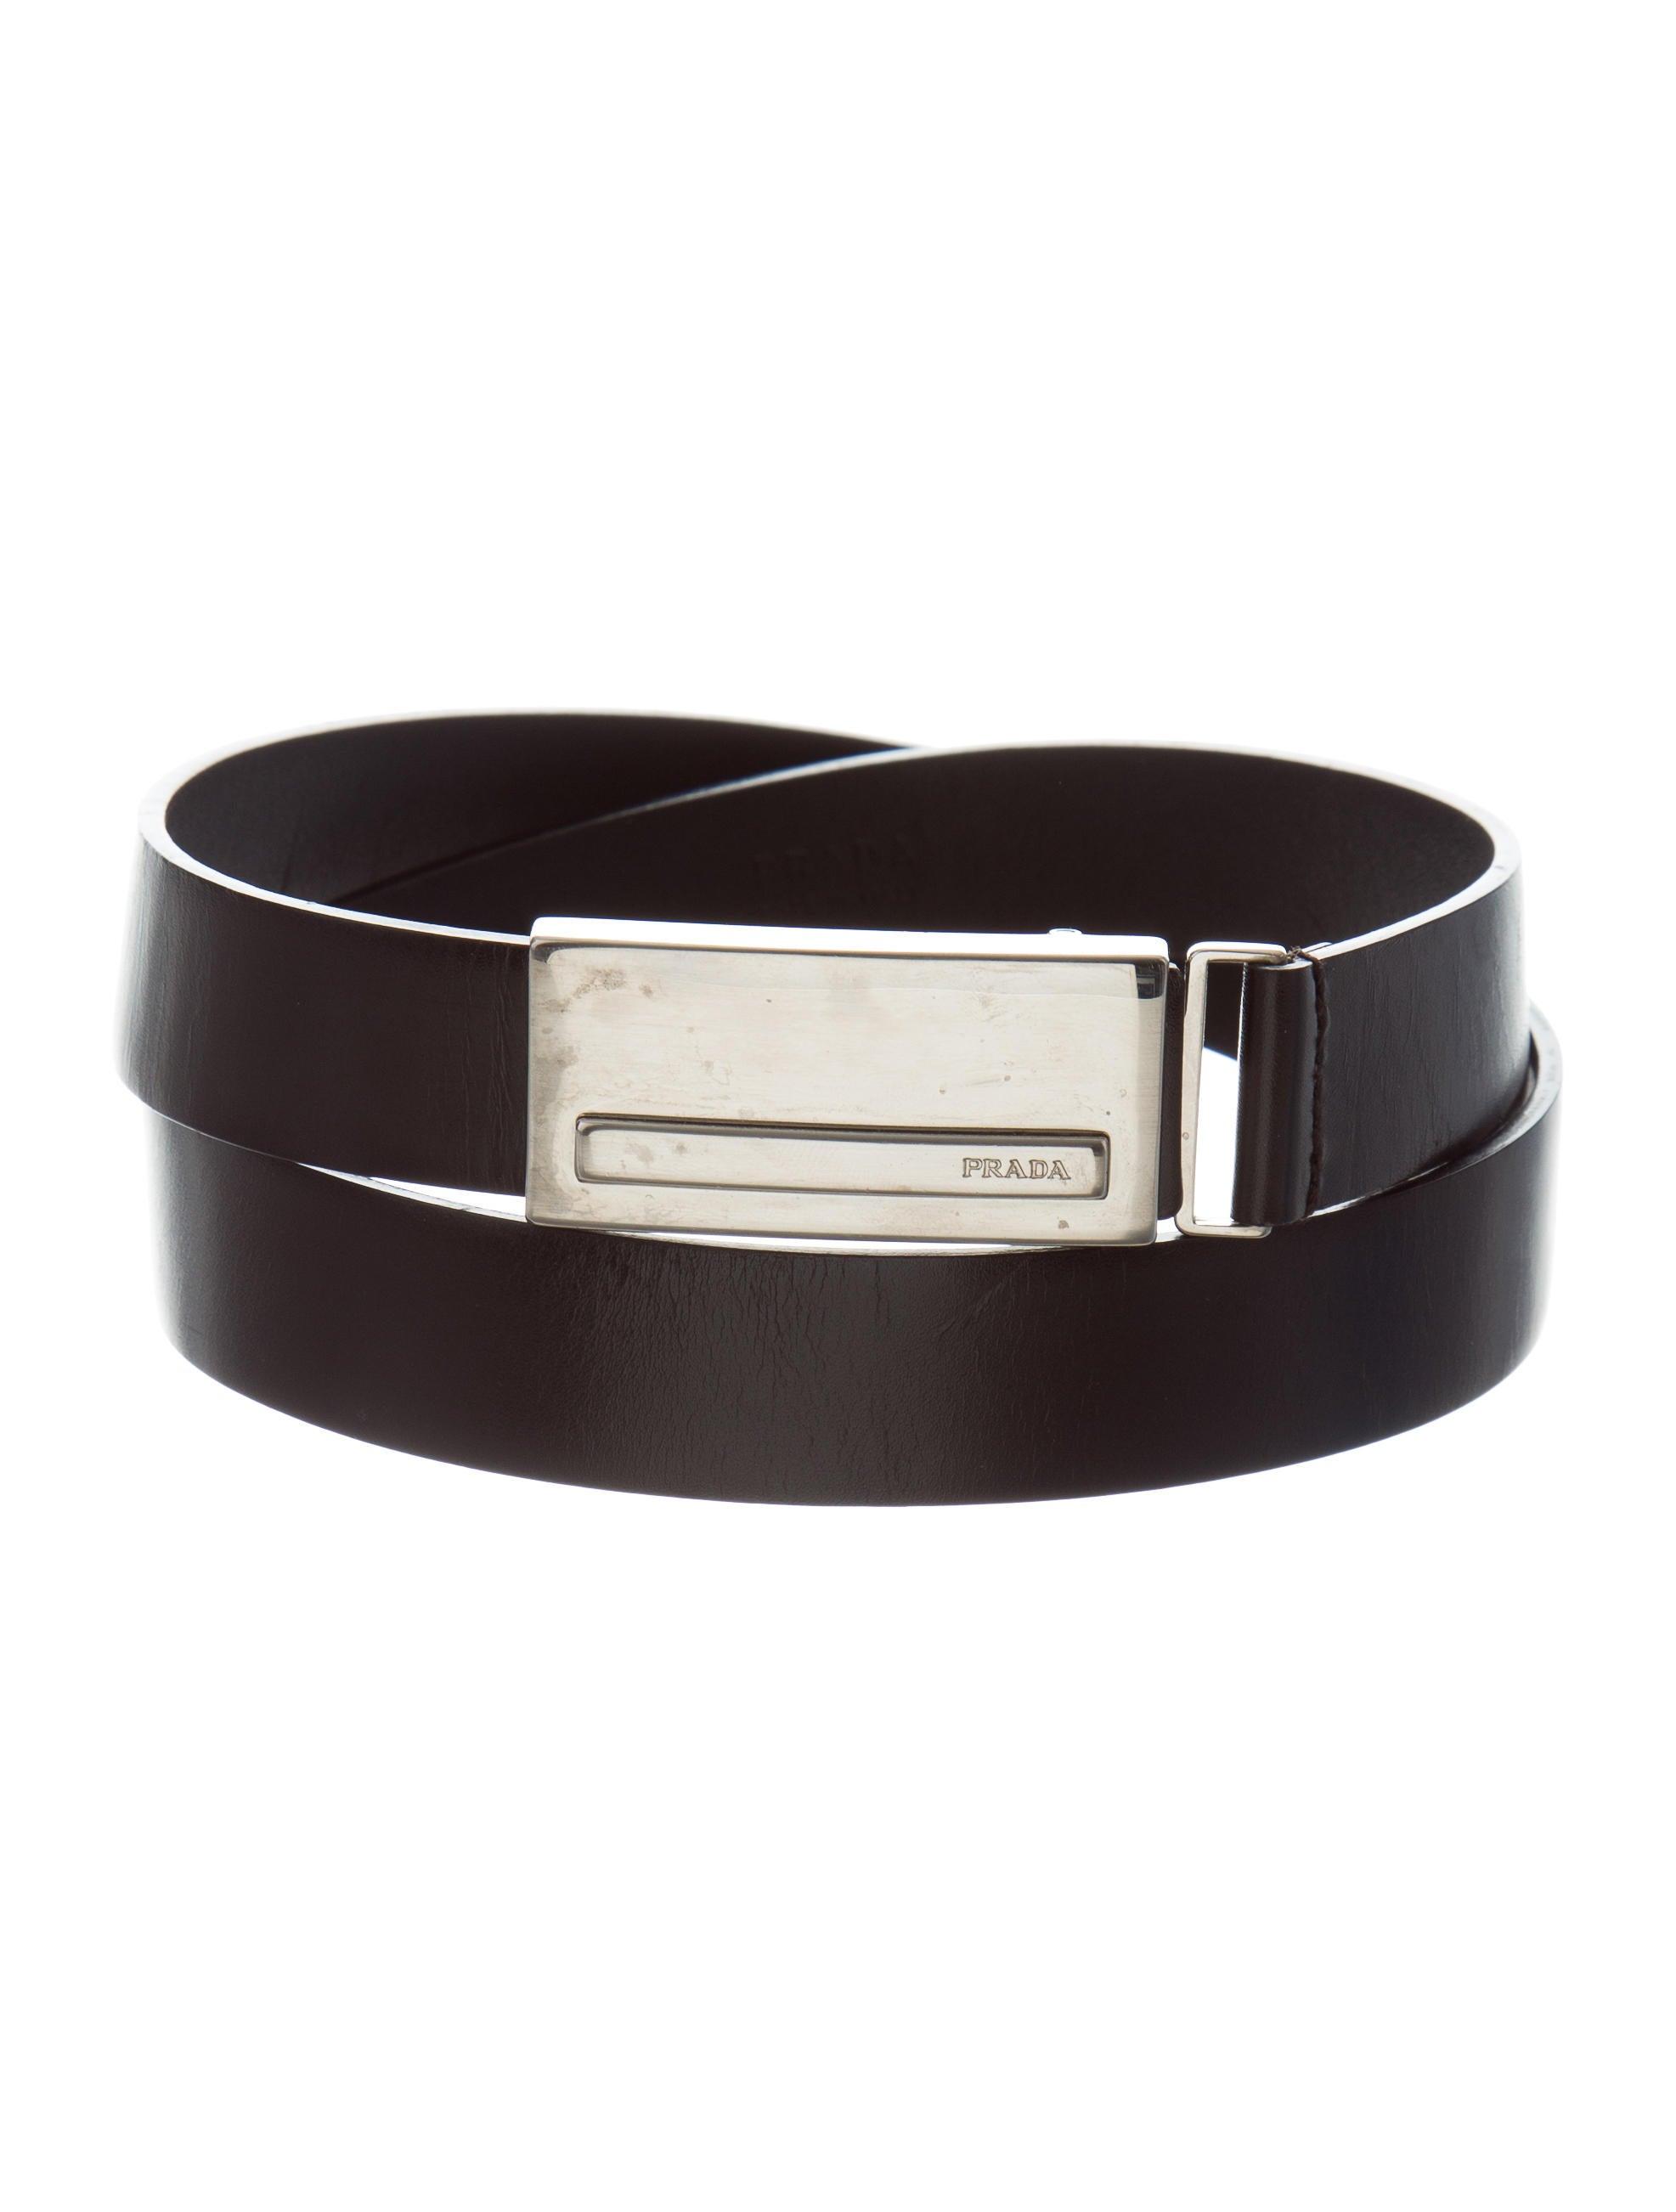 prada leather waist belt accessories pra166319 the